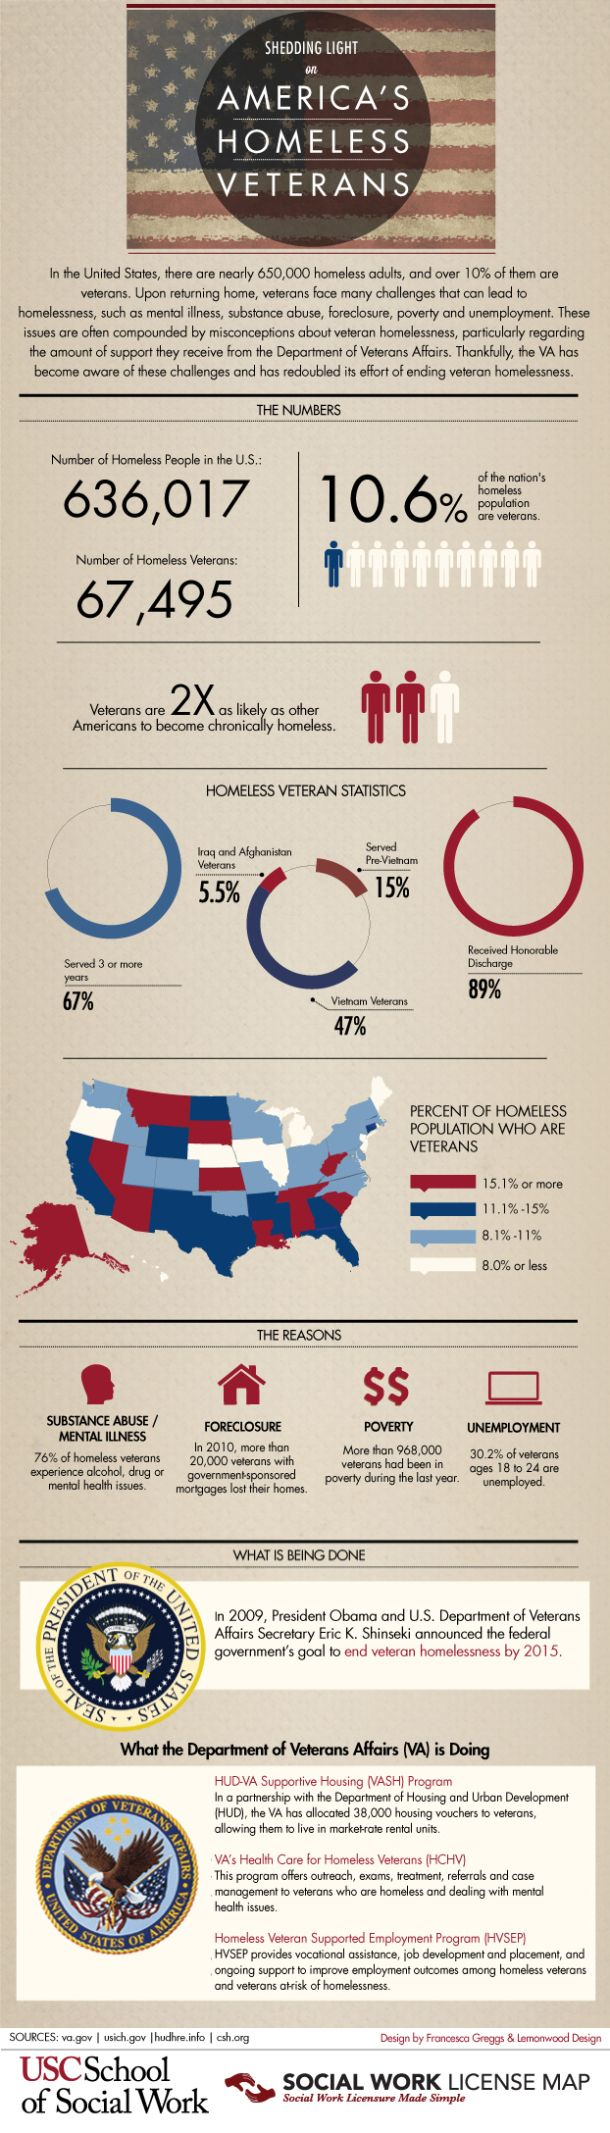 best ideas about hiring veterans disabled shedding light on america s homeless veterans infographic homeless veterans help us